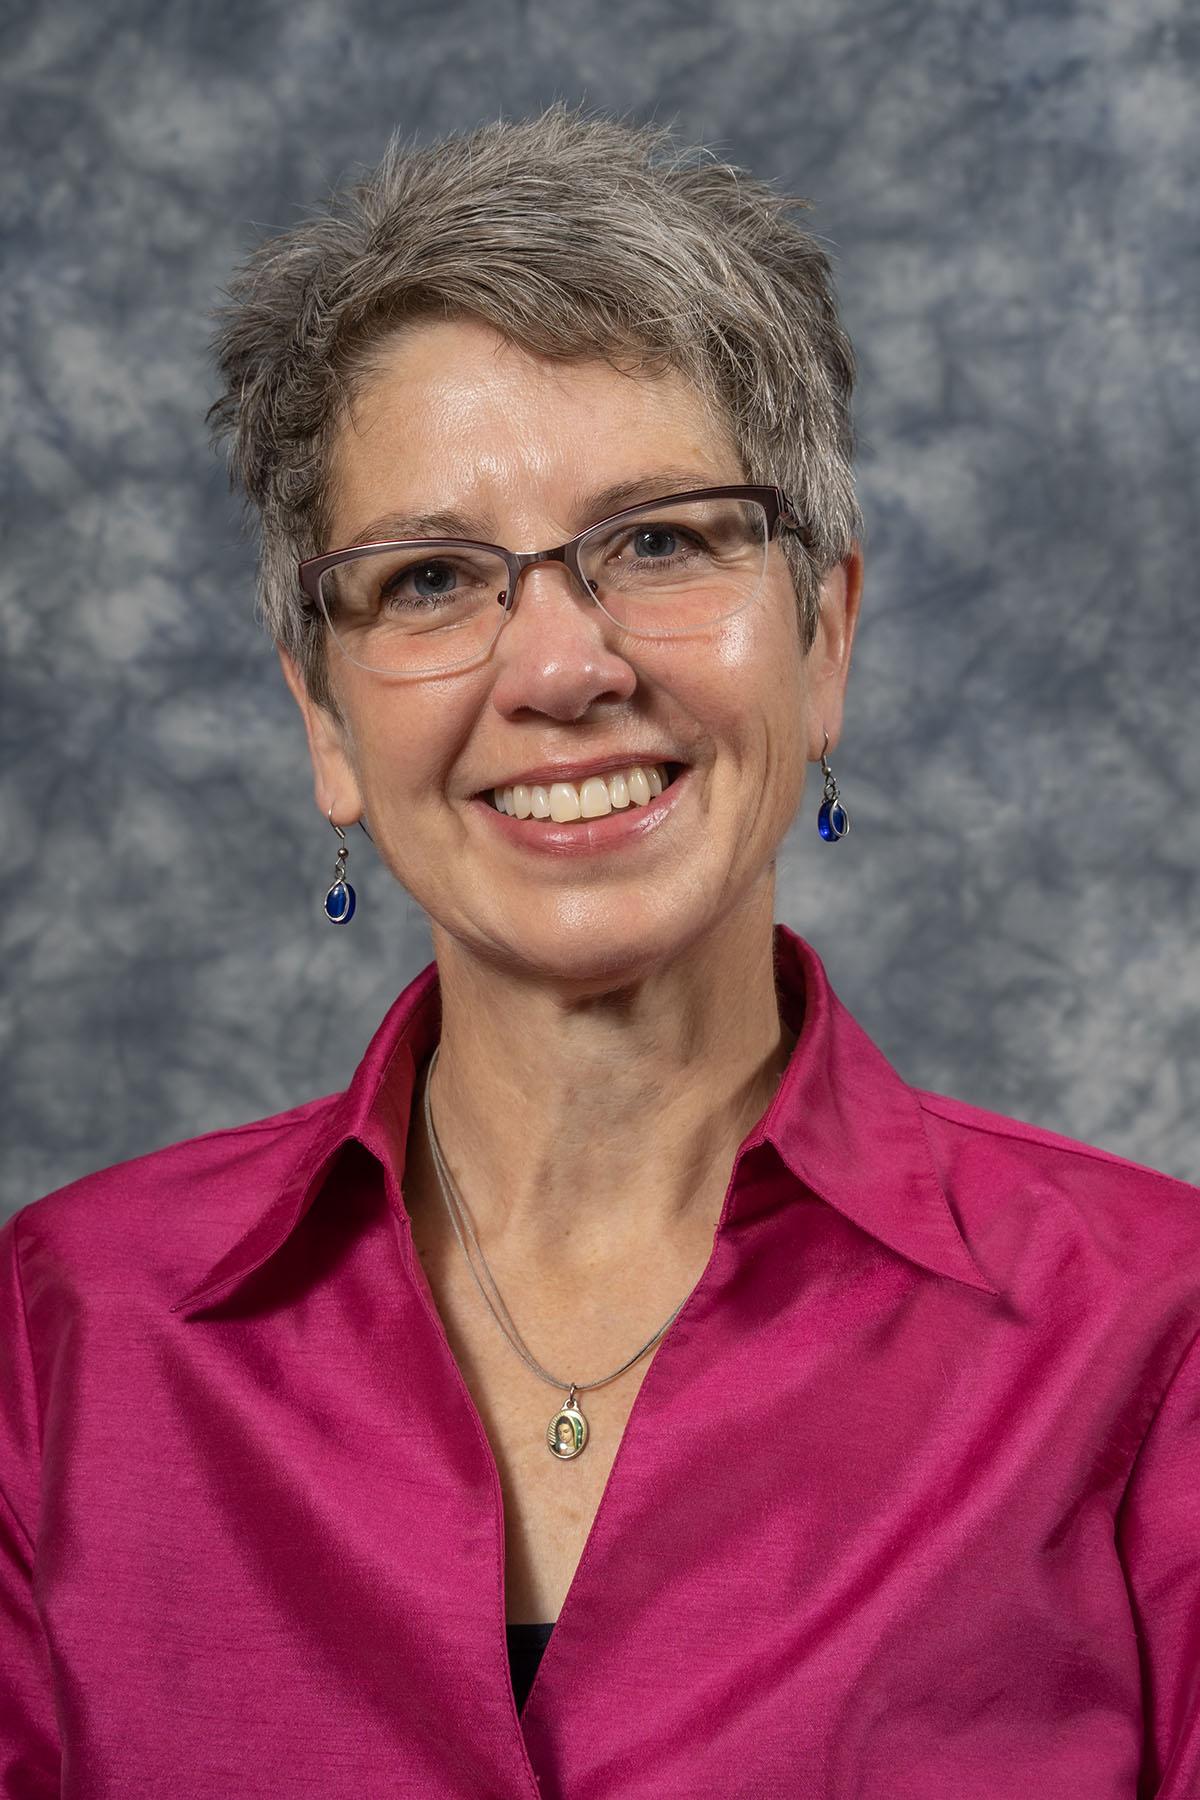 Carla Smiley